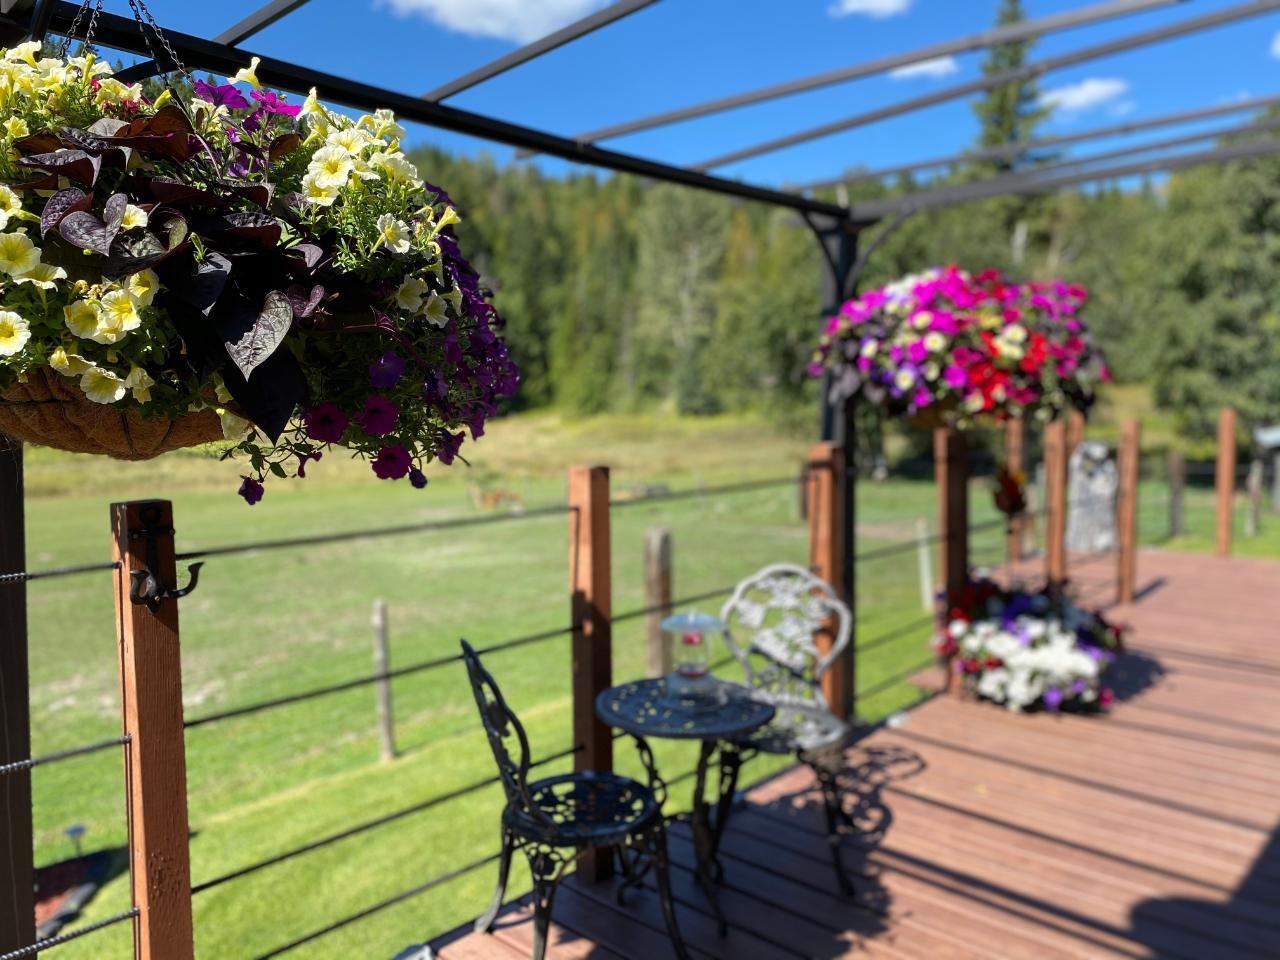 2505 Barley Road, Rossland, British Columbia  V0G 1Y0 - Photo 12 - 2461148